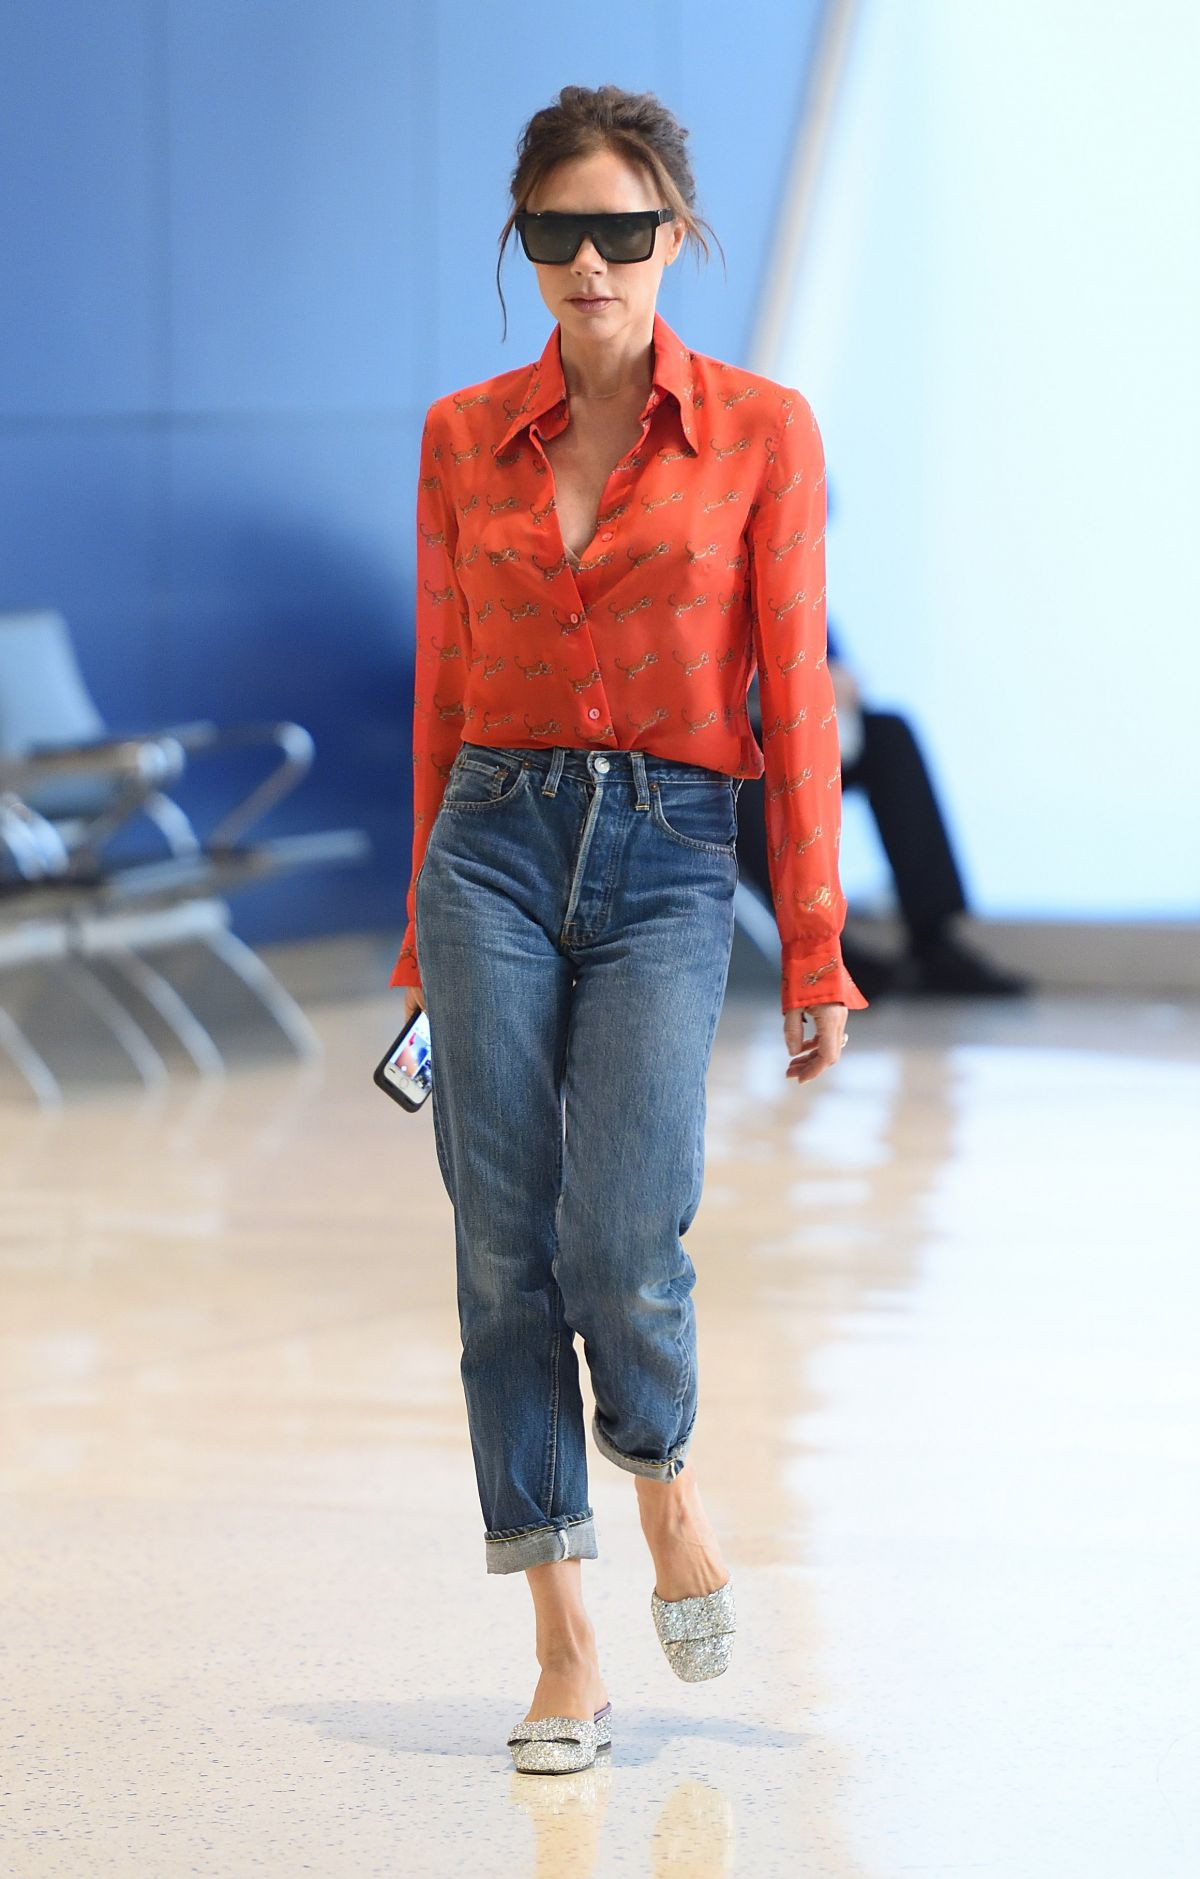 VICTORIA BECKHAM Arrives at JFK Airport in New York 09/15/2017